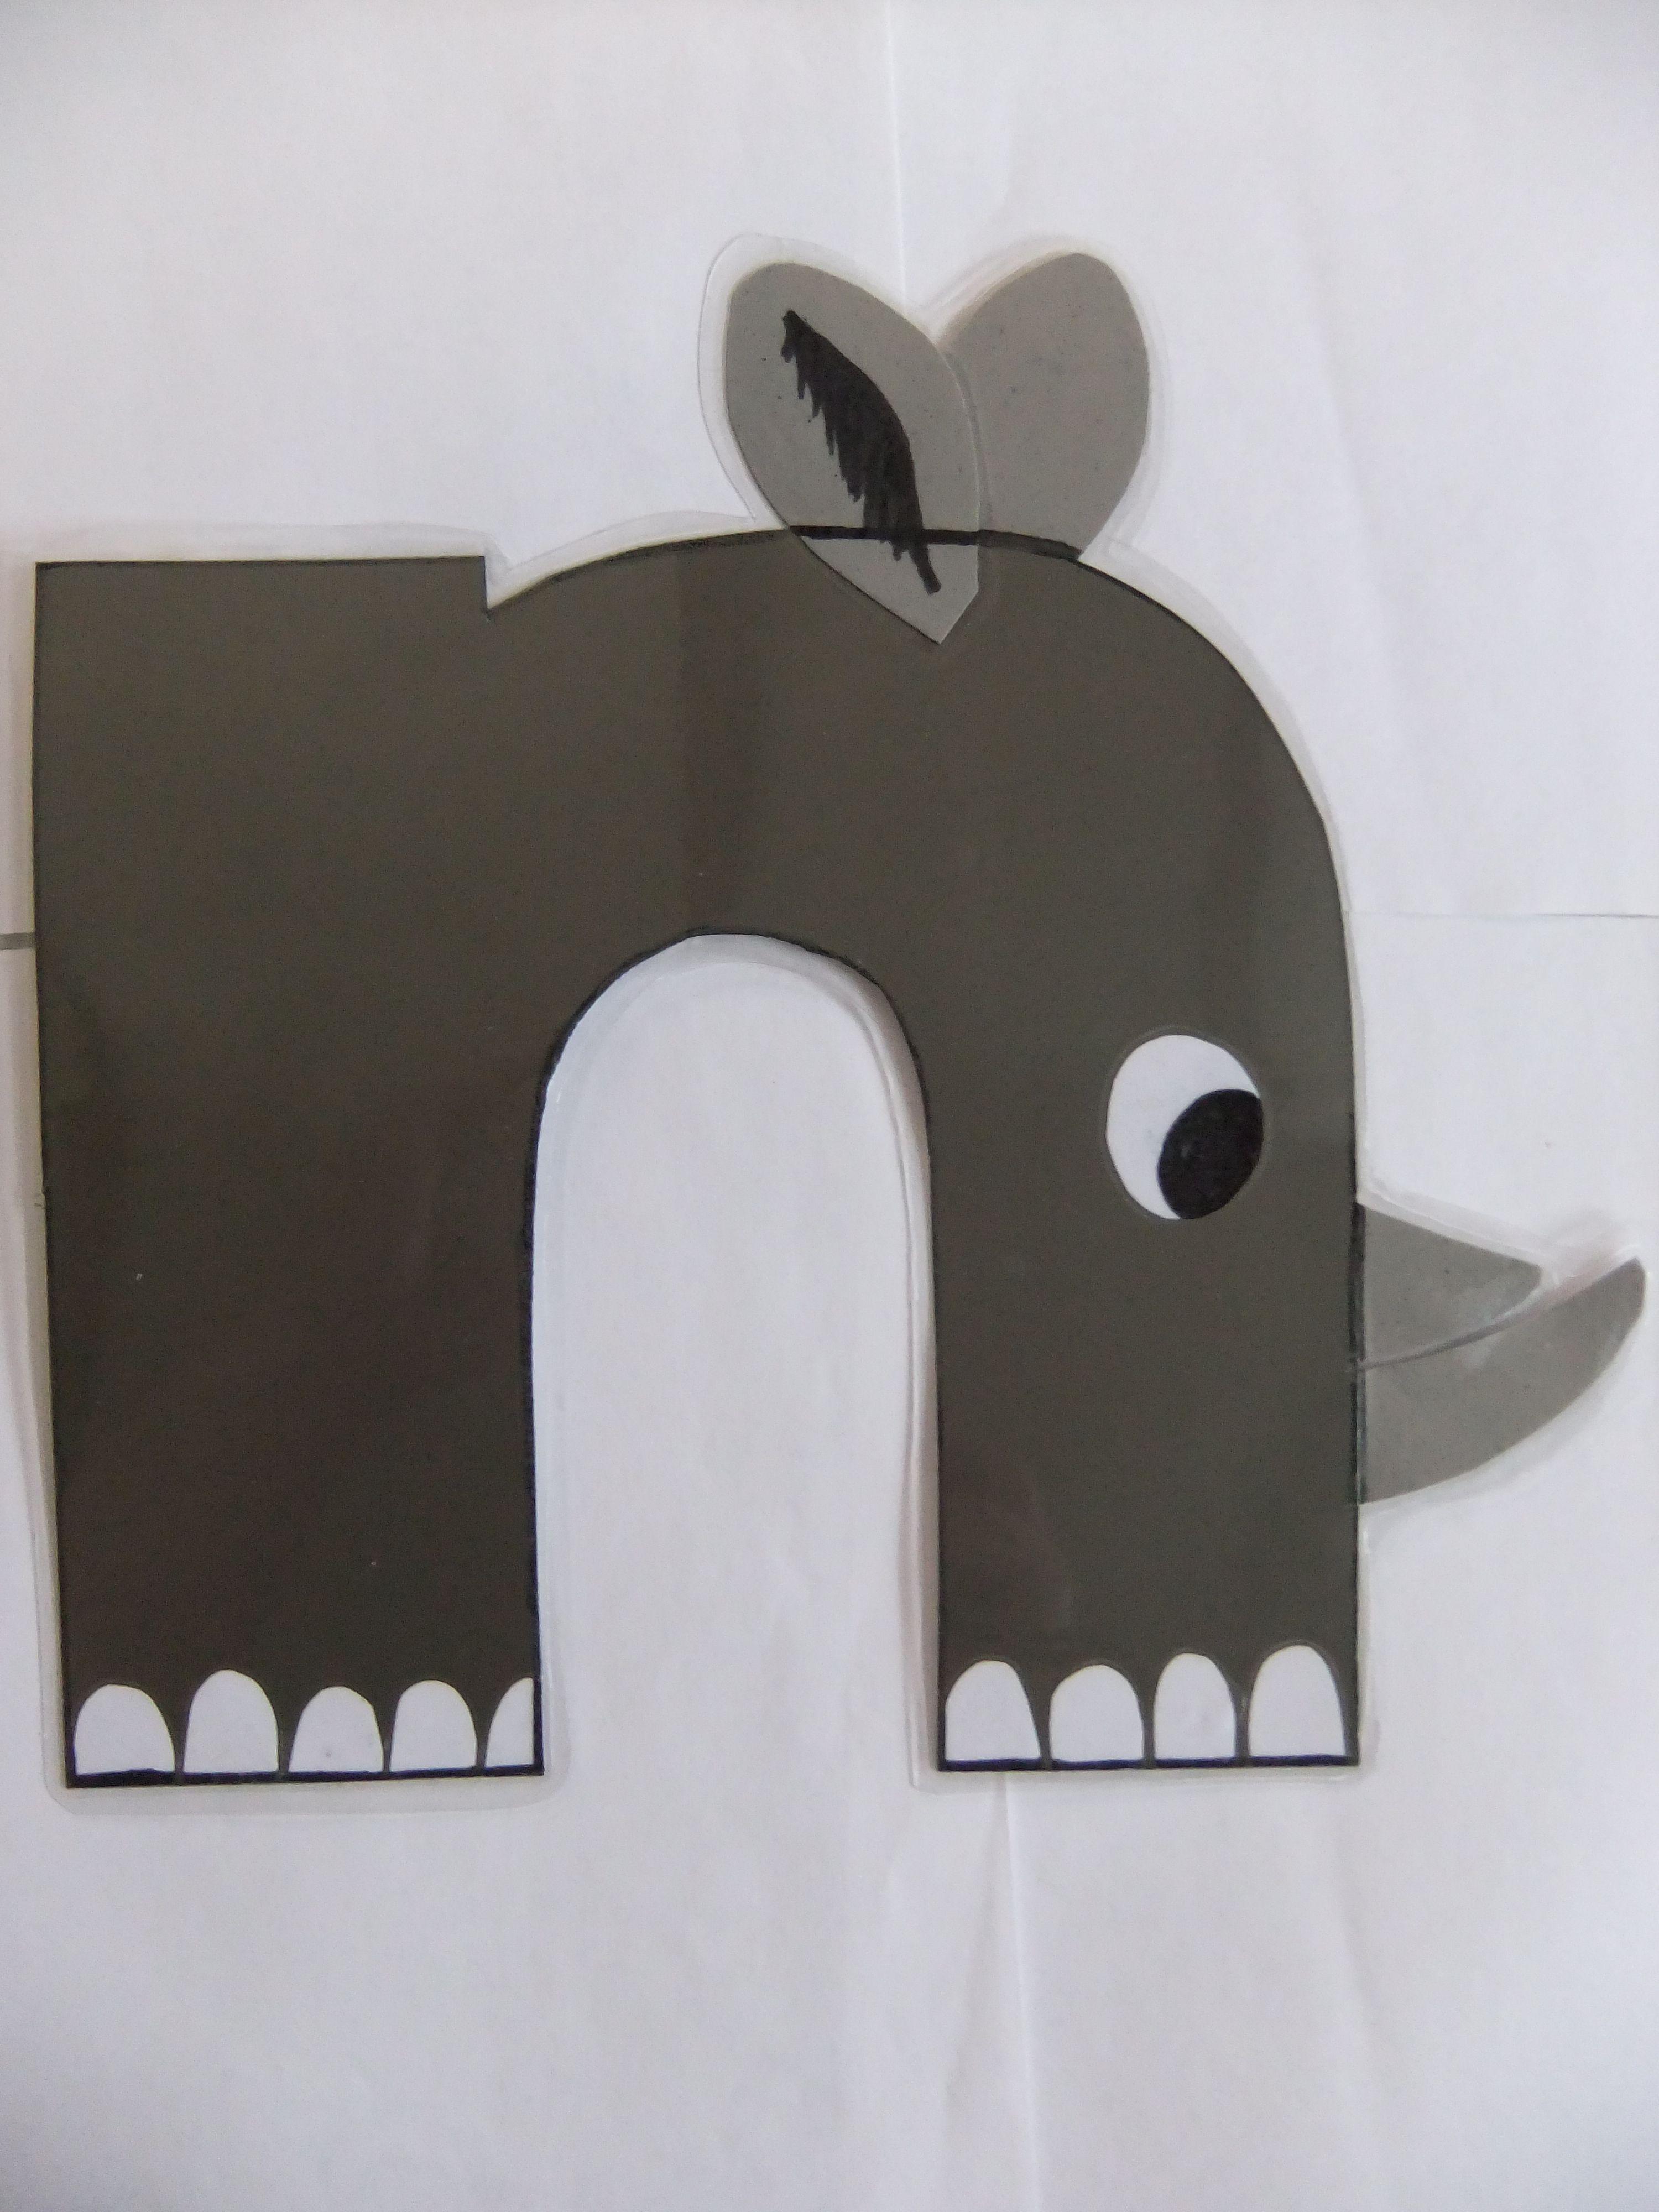 Zelfgemaakt alfabet letter n. neushoorn